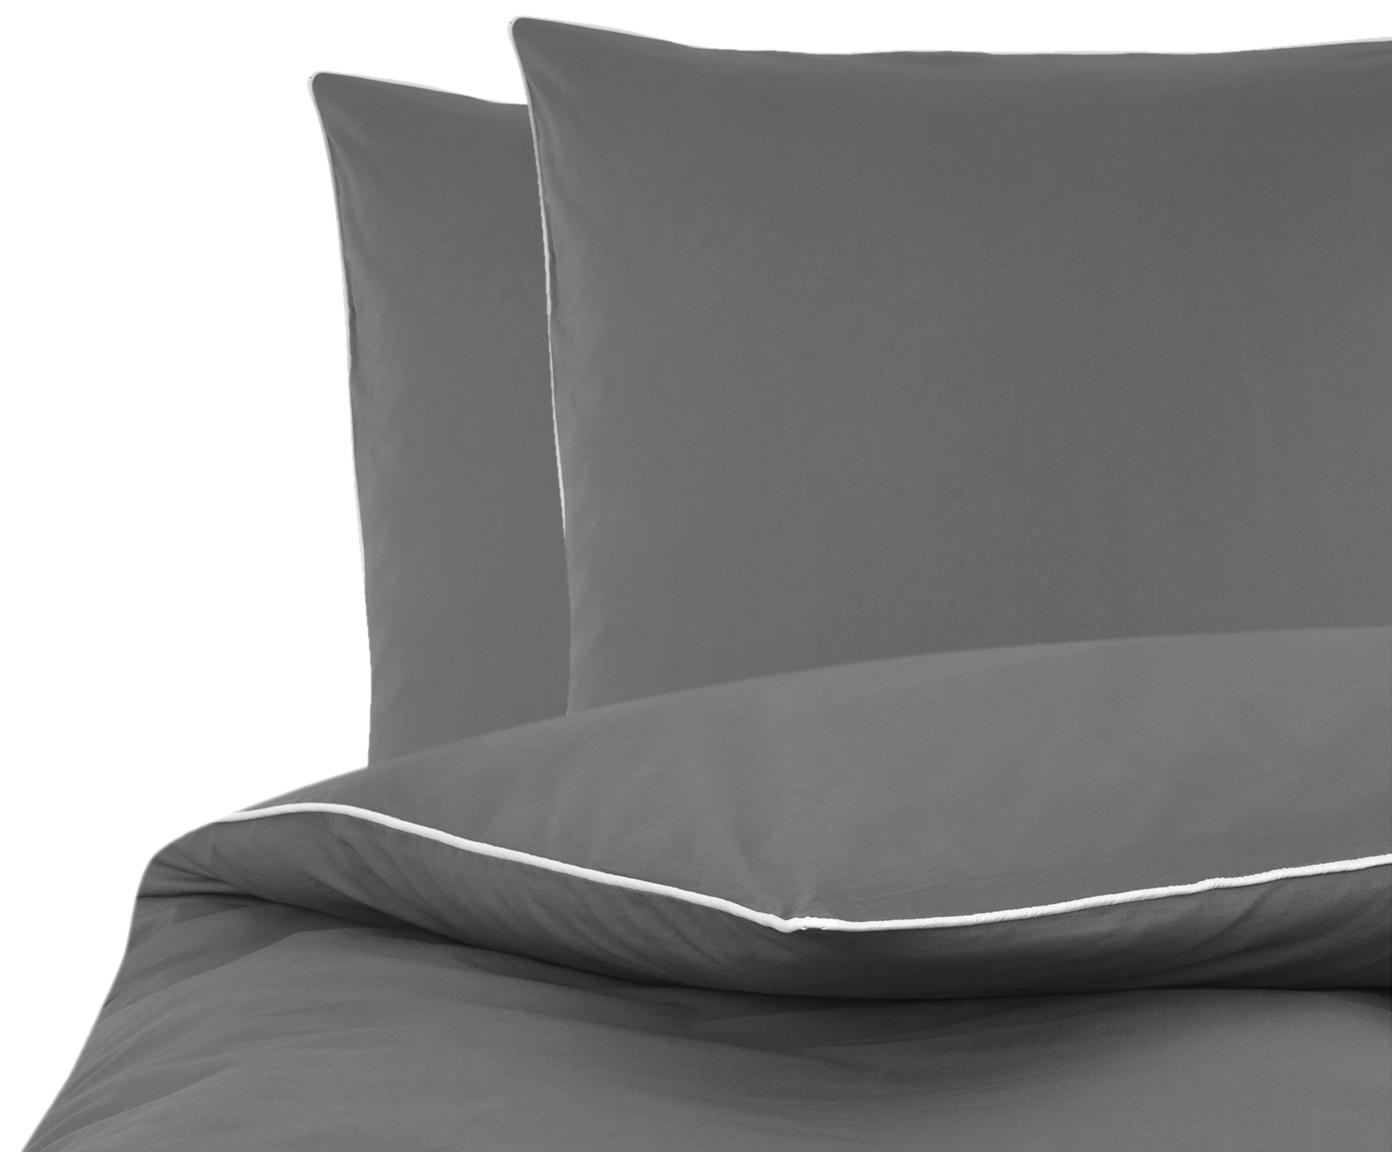 Baumwollperkal-Bettwäsche Daria in Grau mit Keder, Webart: Perkal Fadendichte 200 TC, DunkelgrauKederumrandung: Weiß, 200 x 200 cm + 2 Kissen 80 x 80 cm